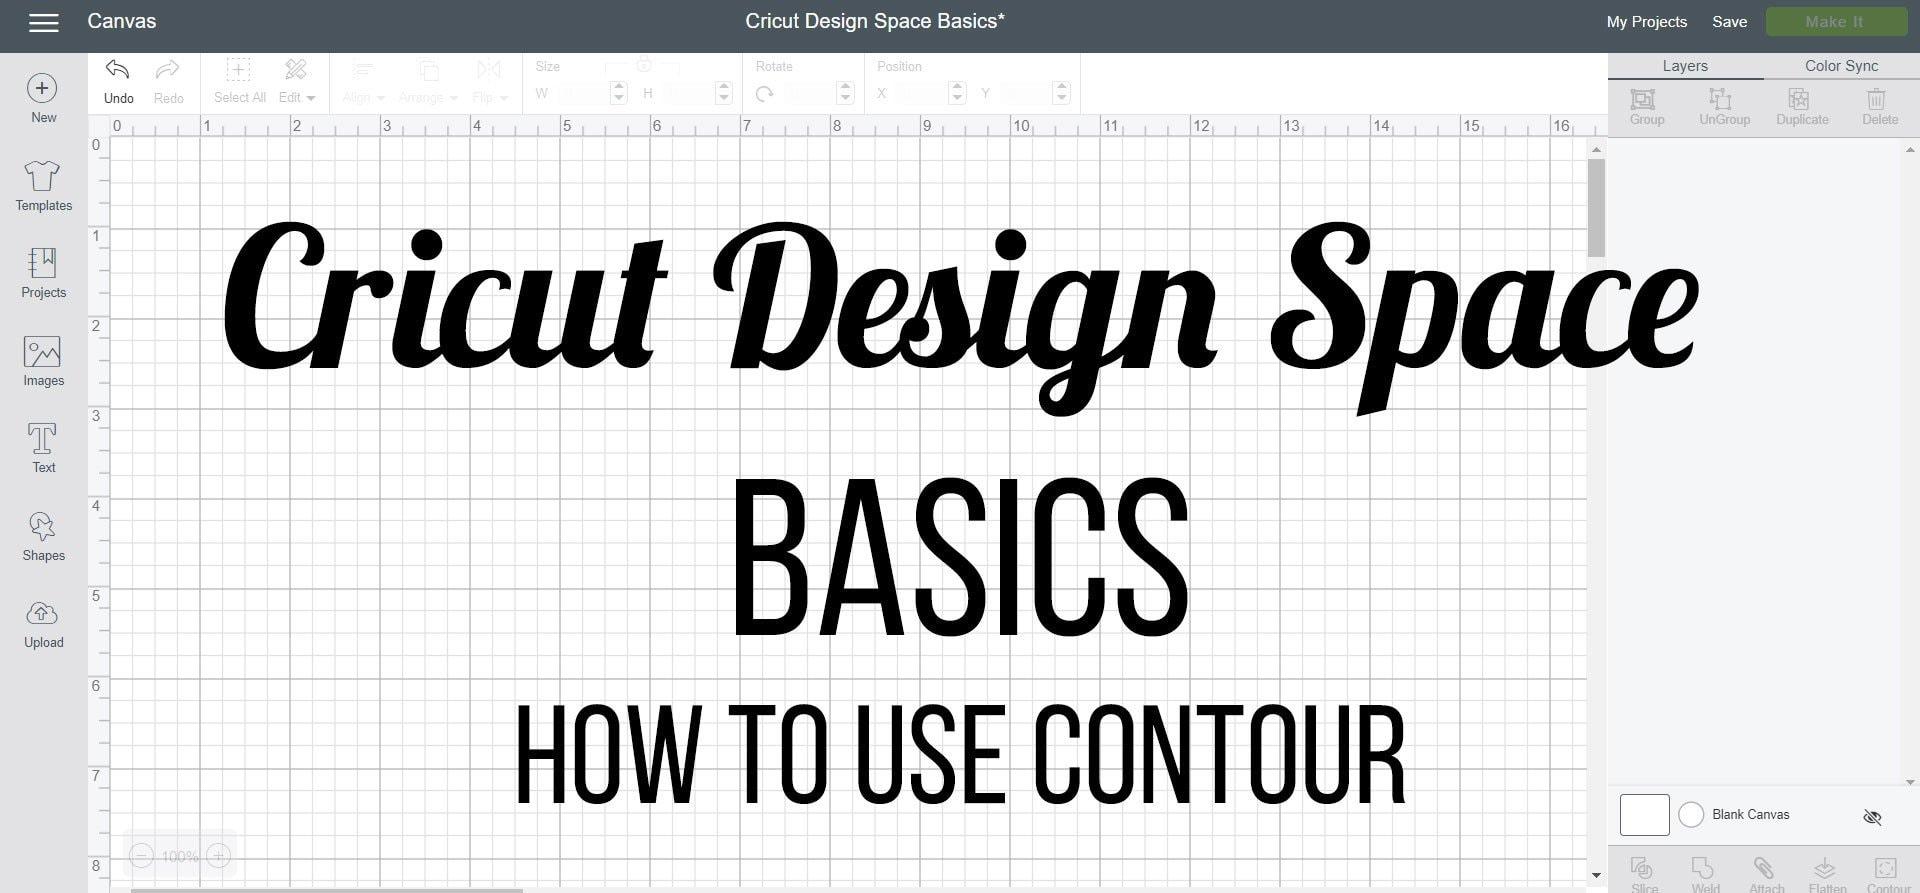 Cricut Design Space Basics - how to use contour